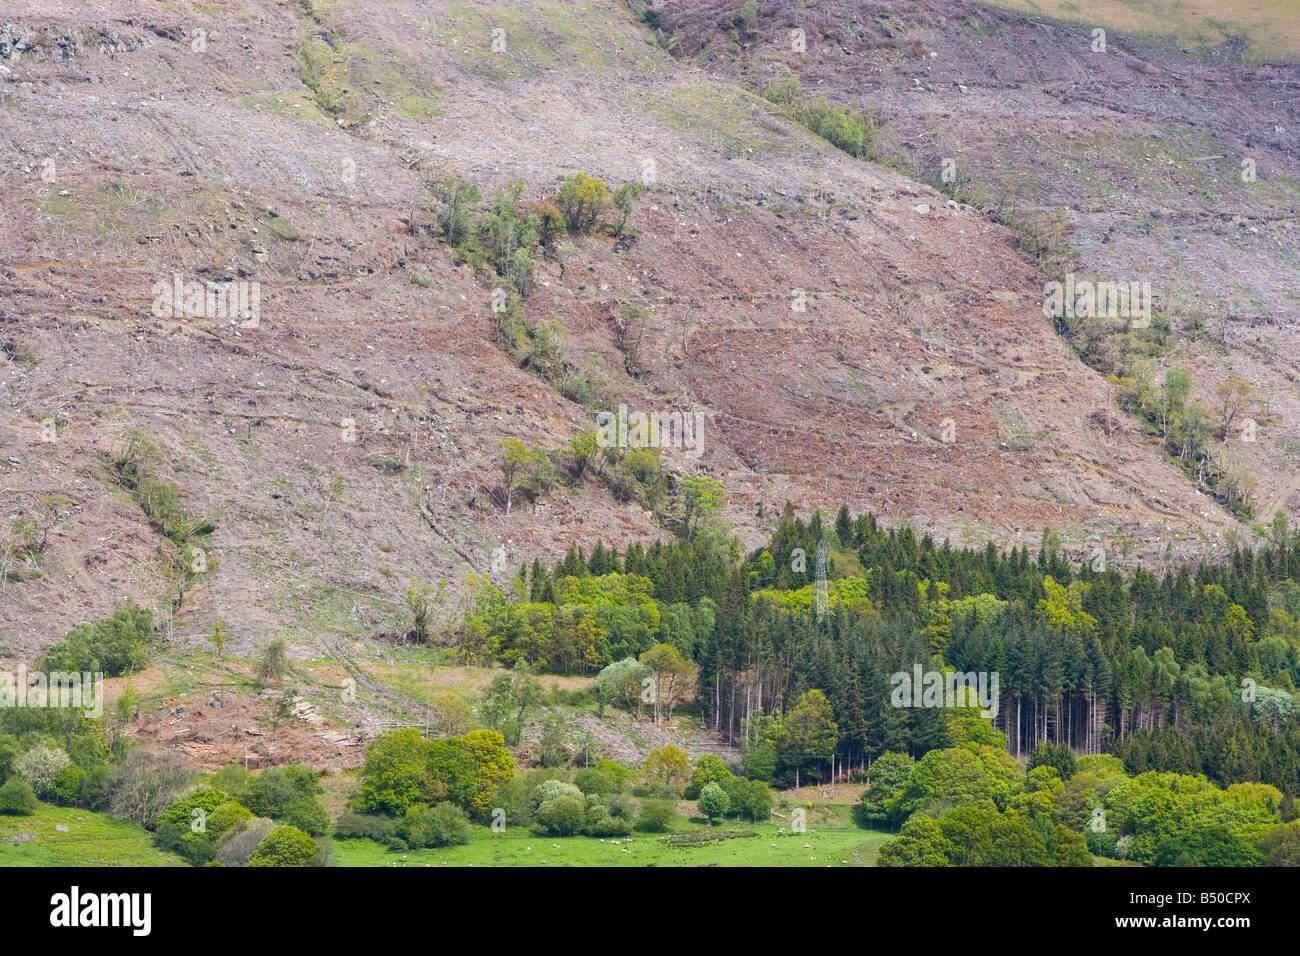 Scottish conifer plantation after being felled. - Stock Image